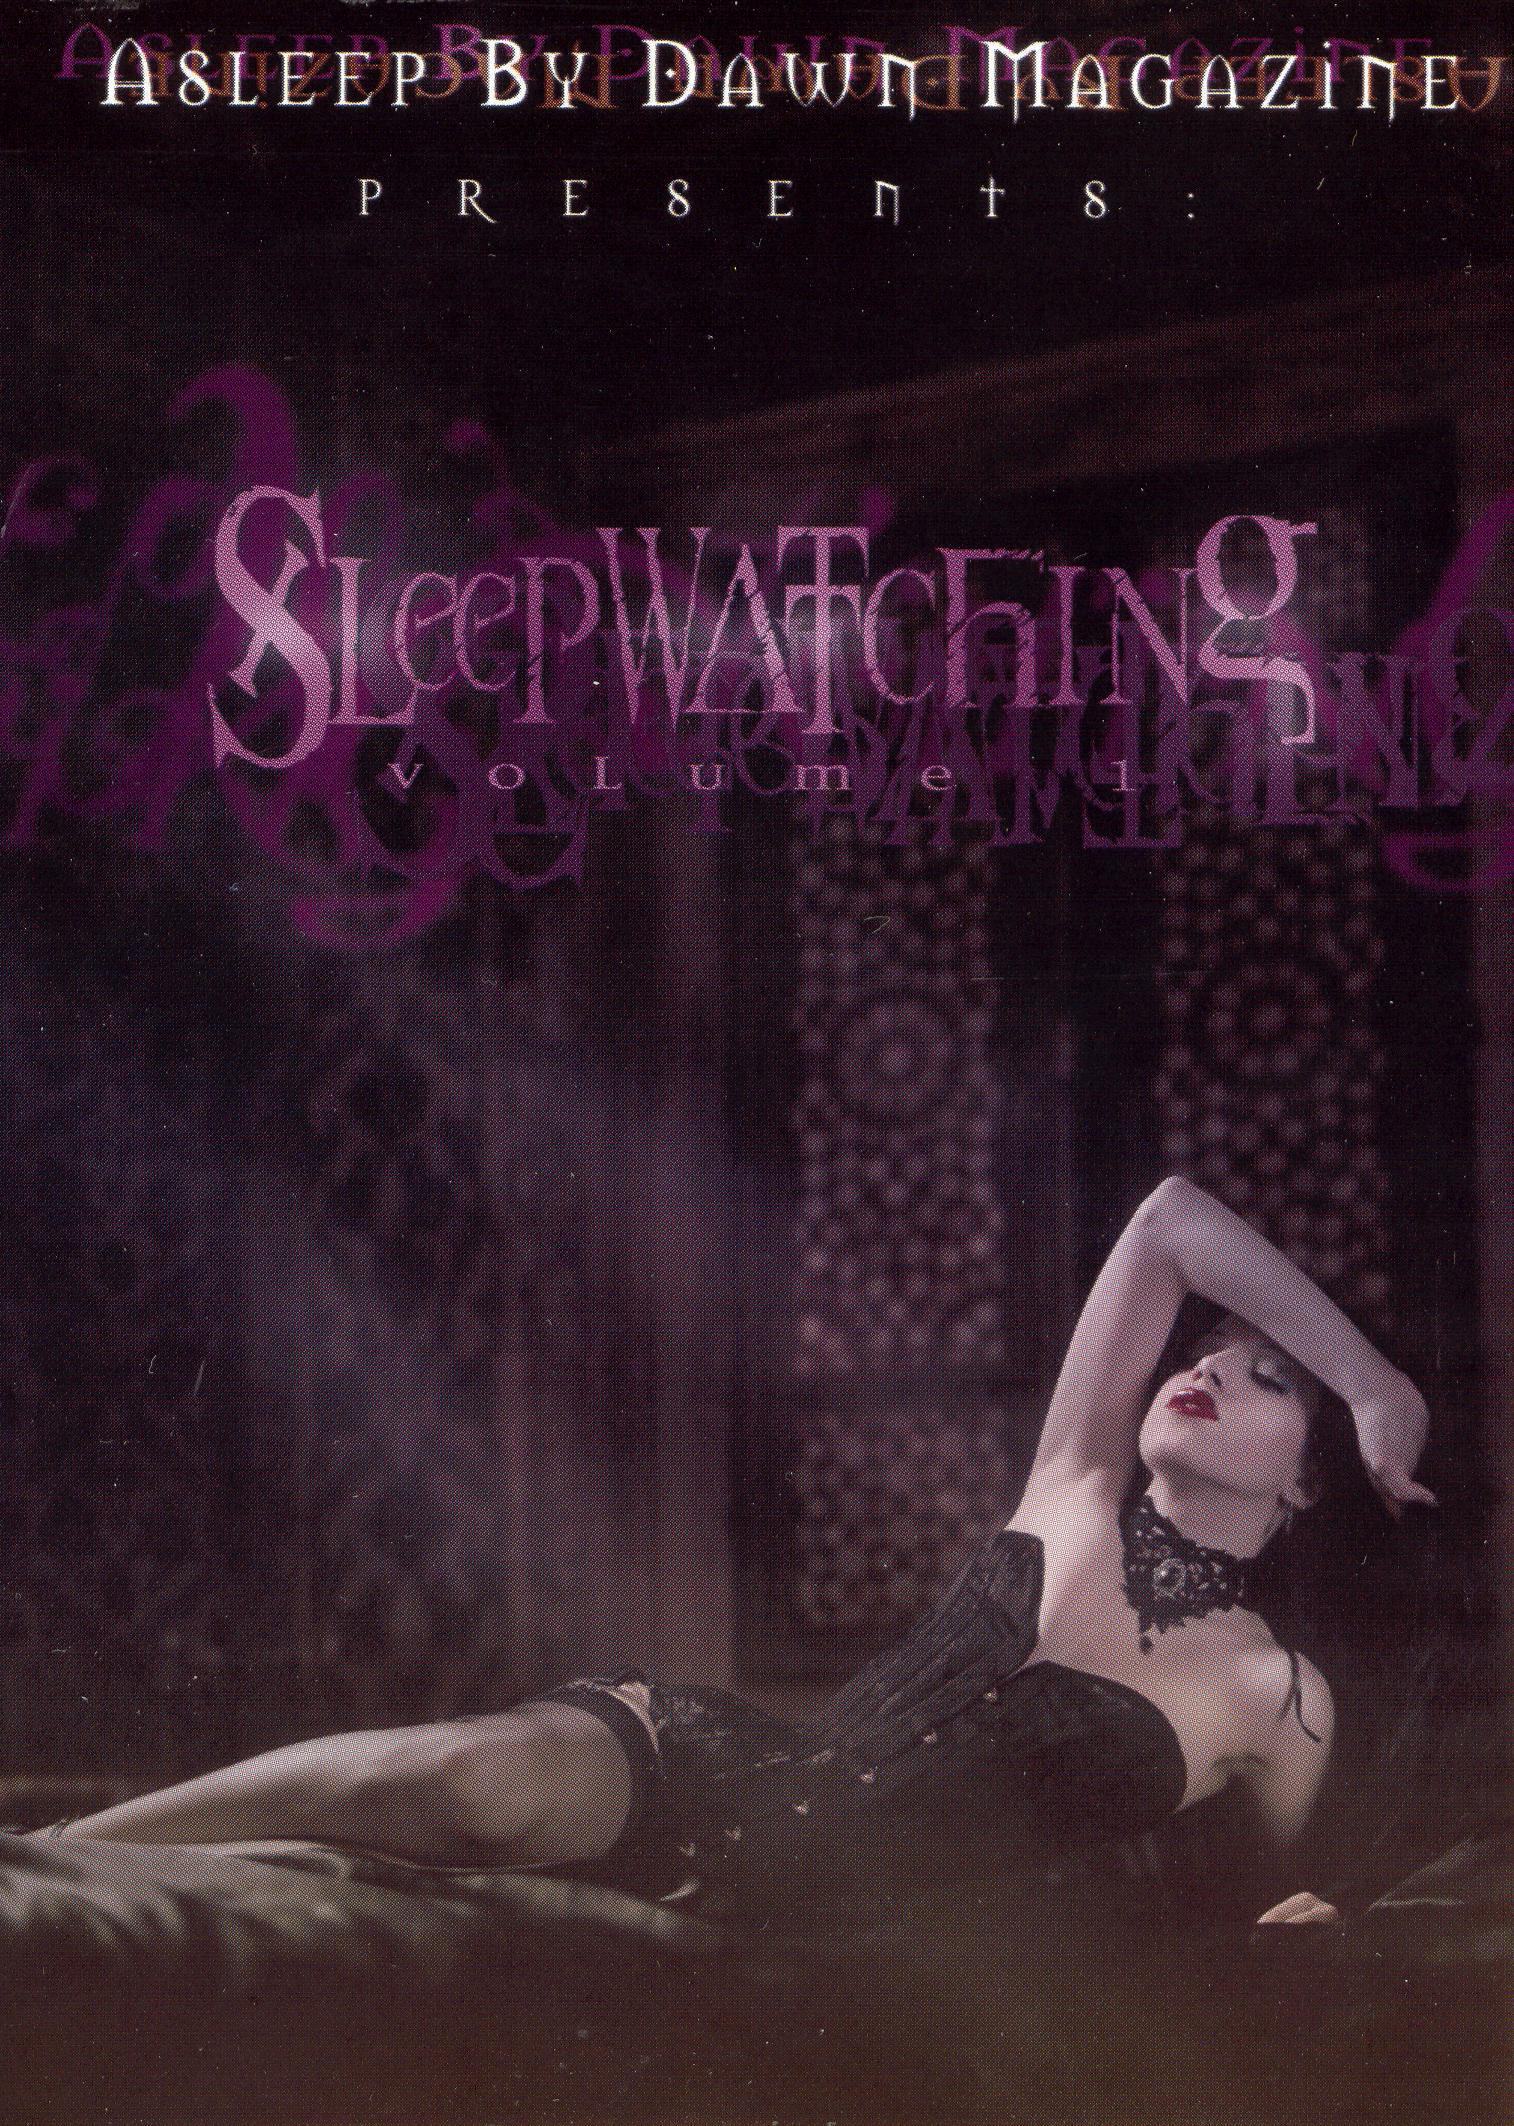 Asleep by Dawn: Sleepwatching, Vol. 1